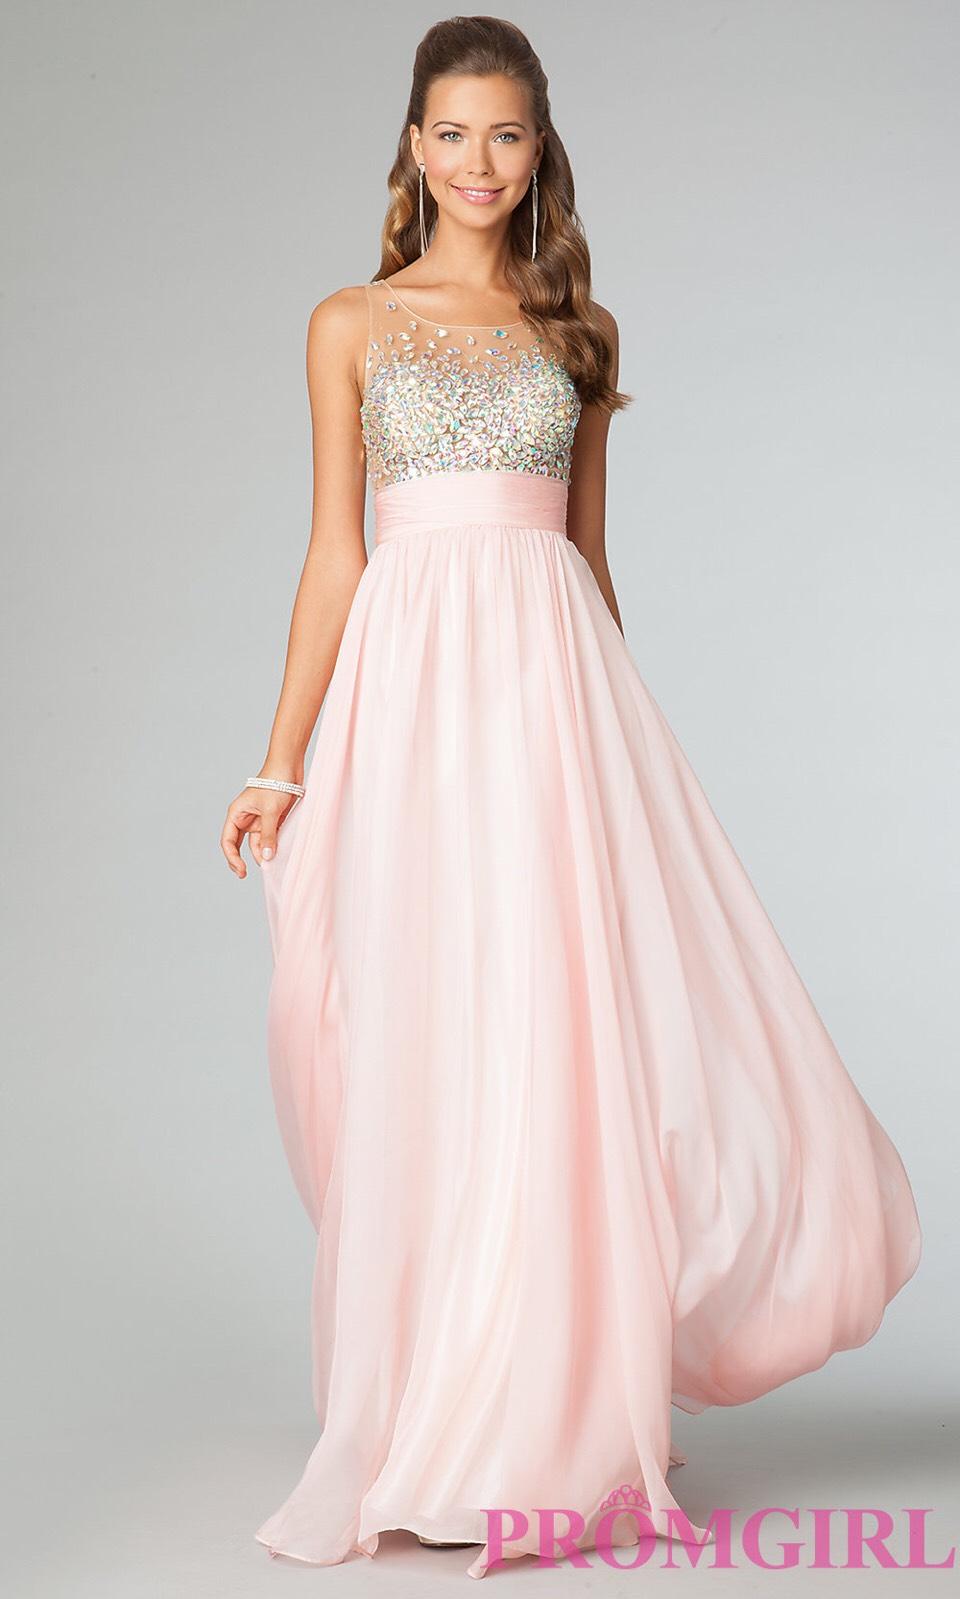 My favorite dress yet